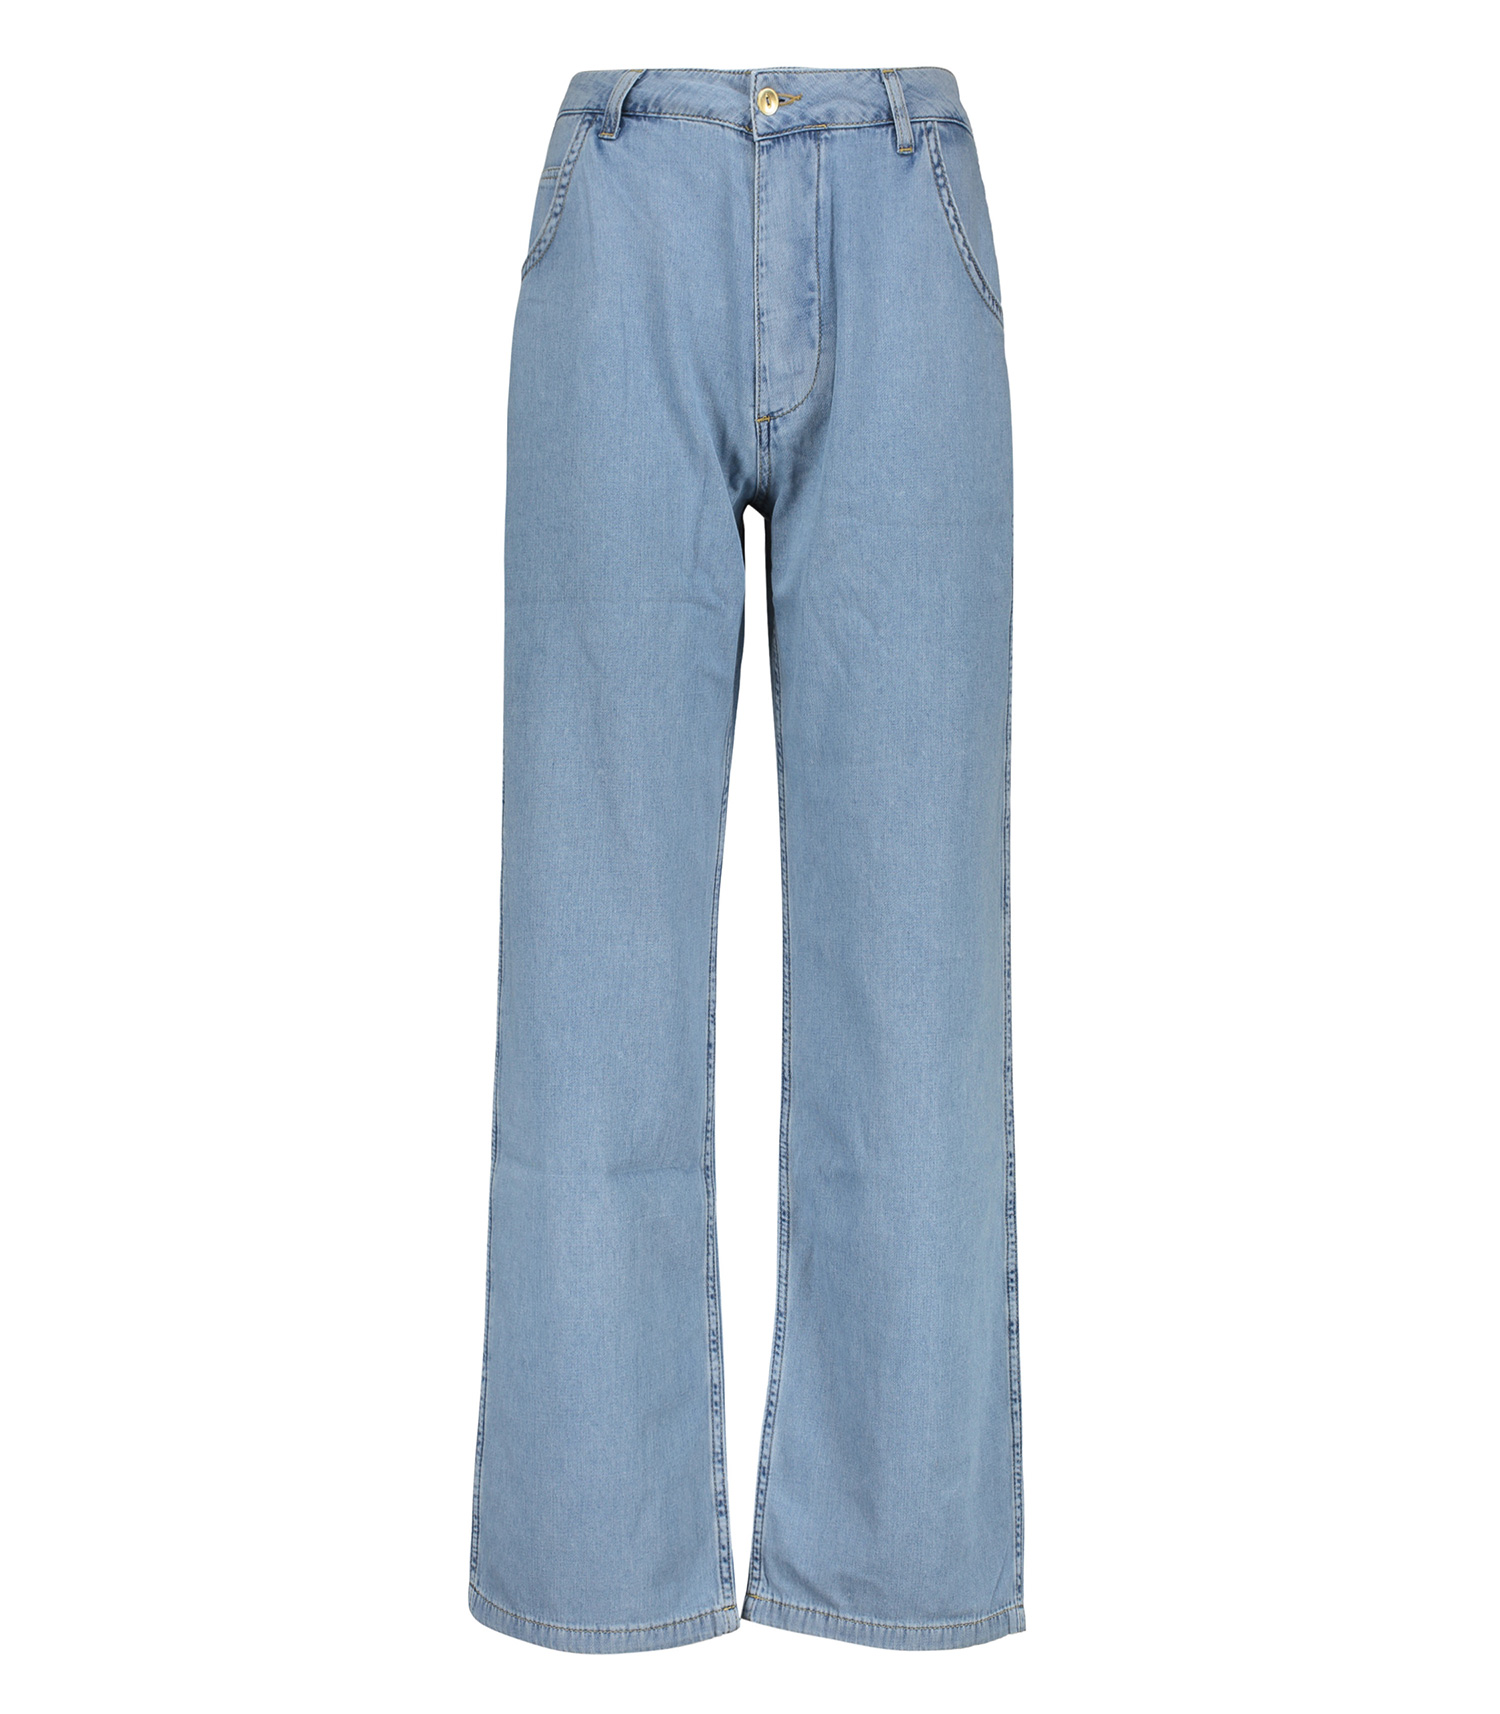 quality products cozy fresh discount sale Pantalon Large Blue Denim Ragdoll LA - Jane de Boy